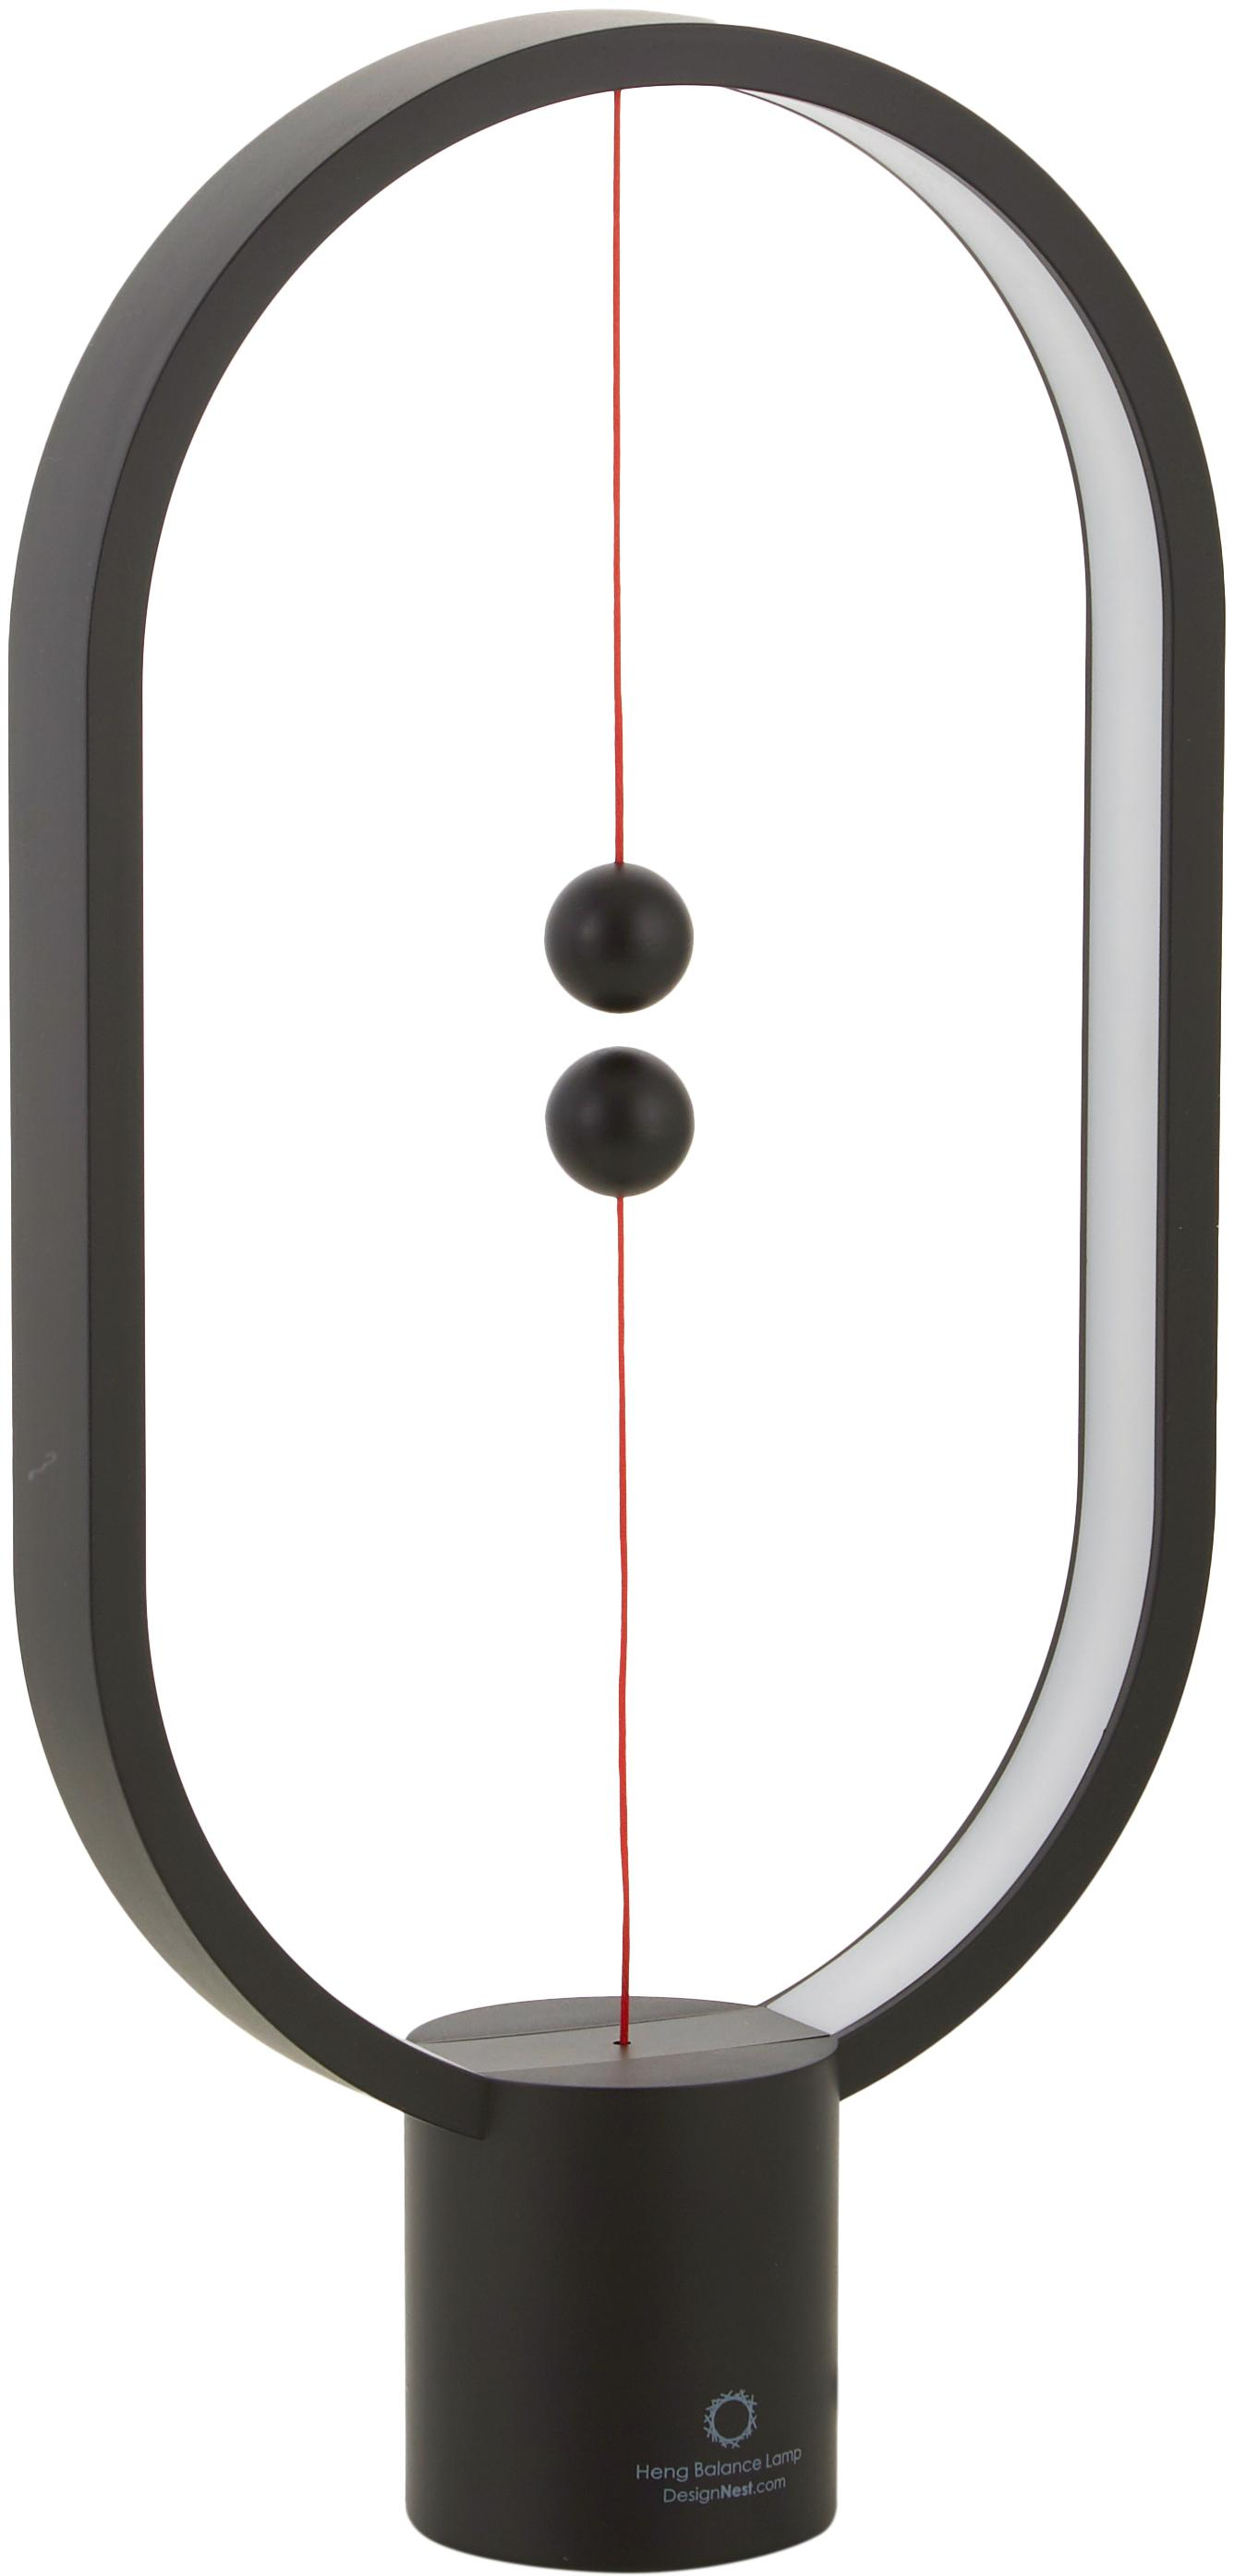 Moderne LED Tischlampe Heng, Weiss, 20 x 40 cm